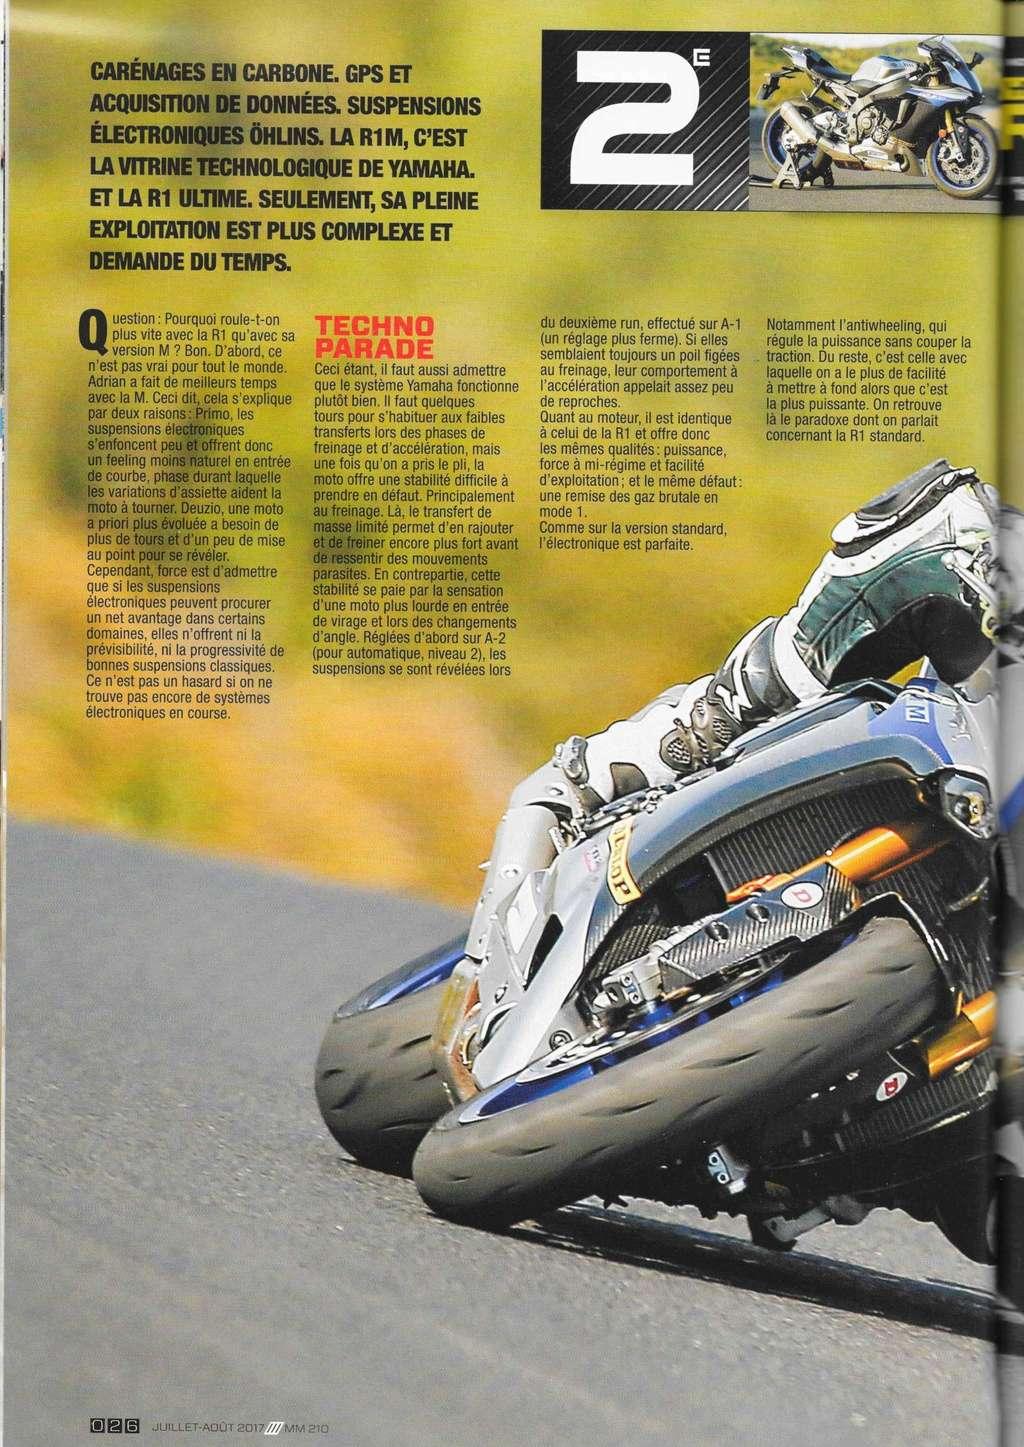 Yamaha R1 et R1M  Crossplane 2015 ( sujet numero3 ) - Page 7 Filena14